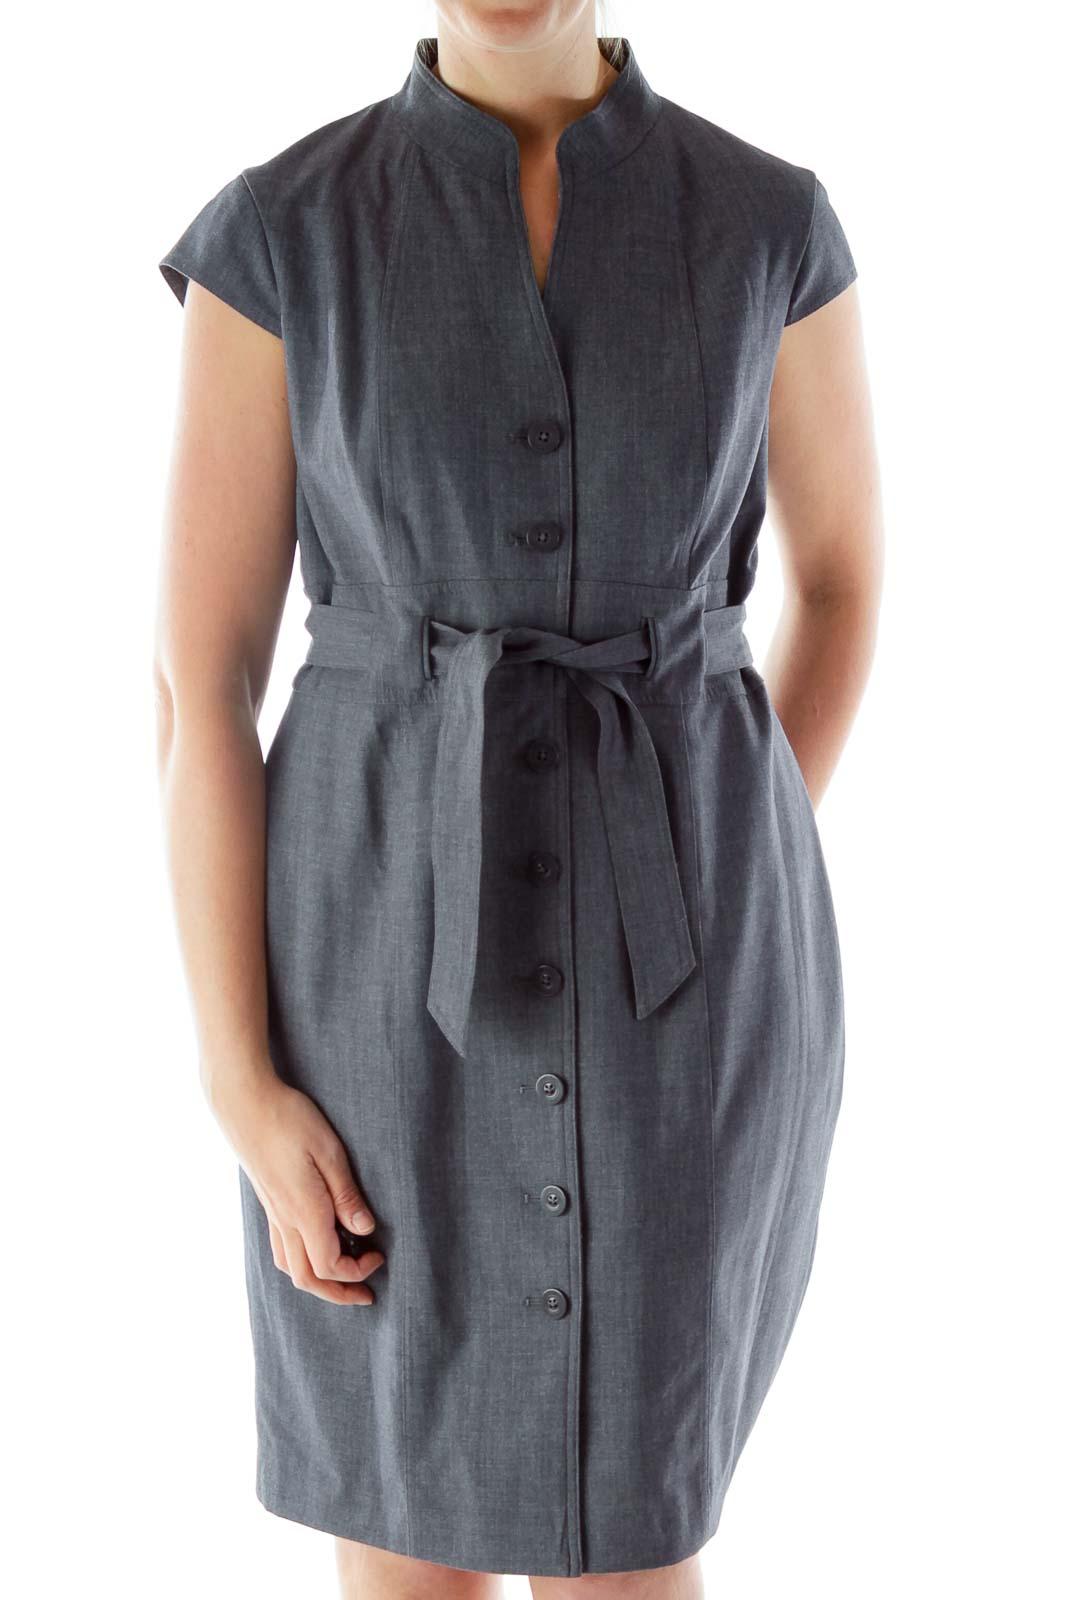 Gray Buttoned V-Neck Belted Work Dress Front